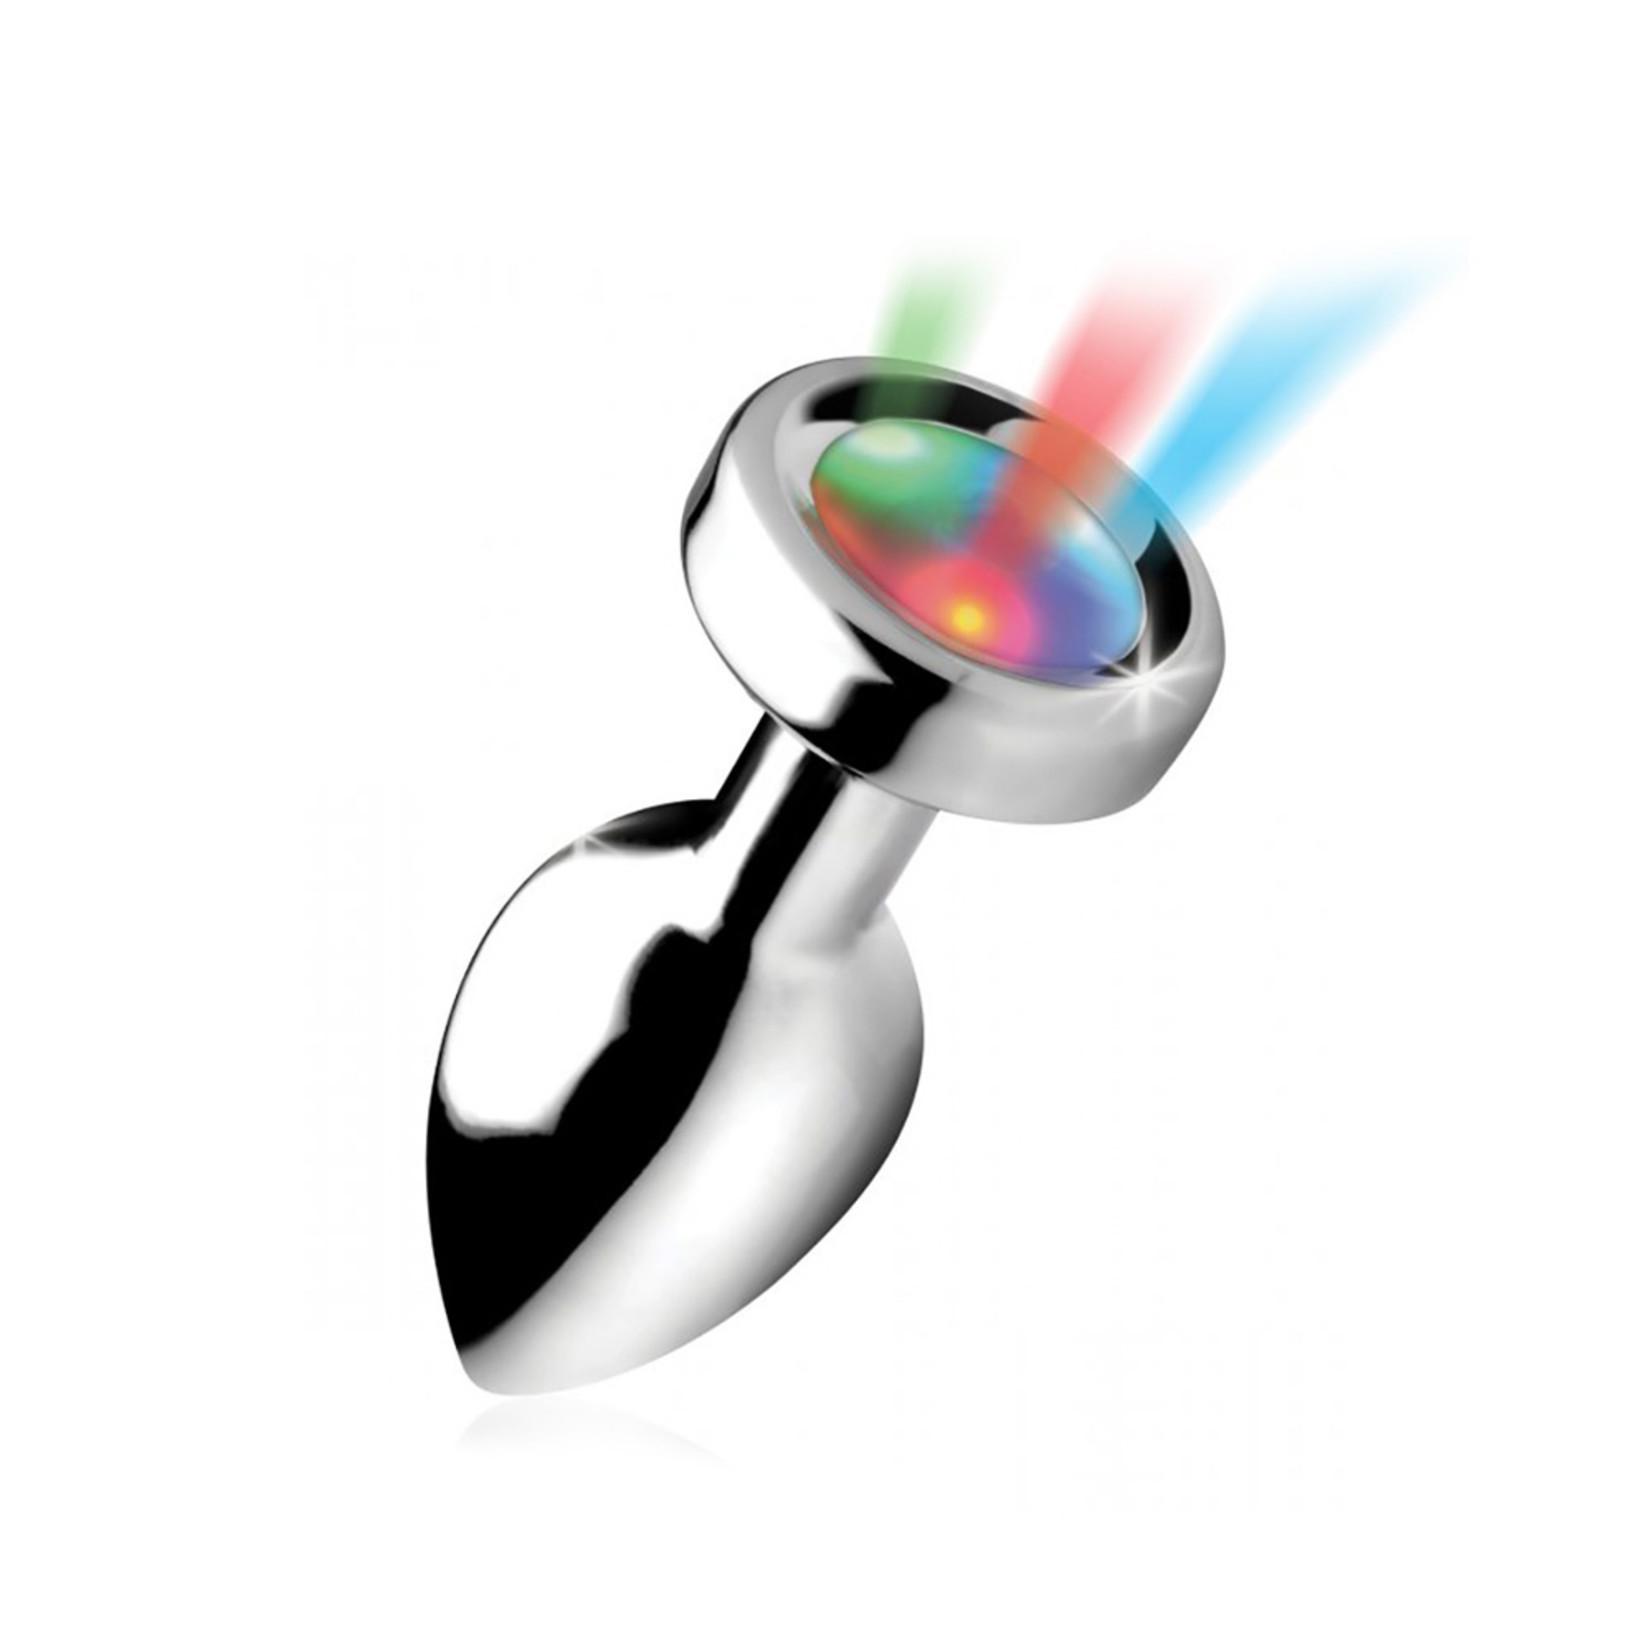 Master Series Light Up Small Anal Plug + Free Vibrating Ring